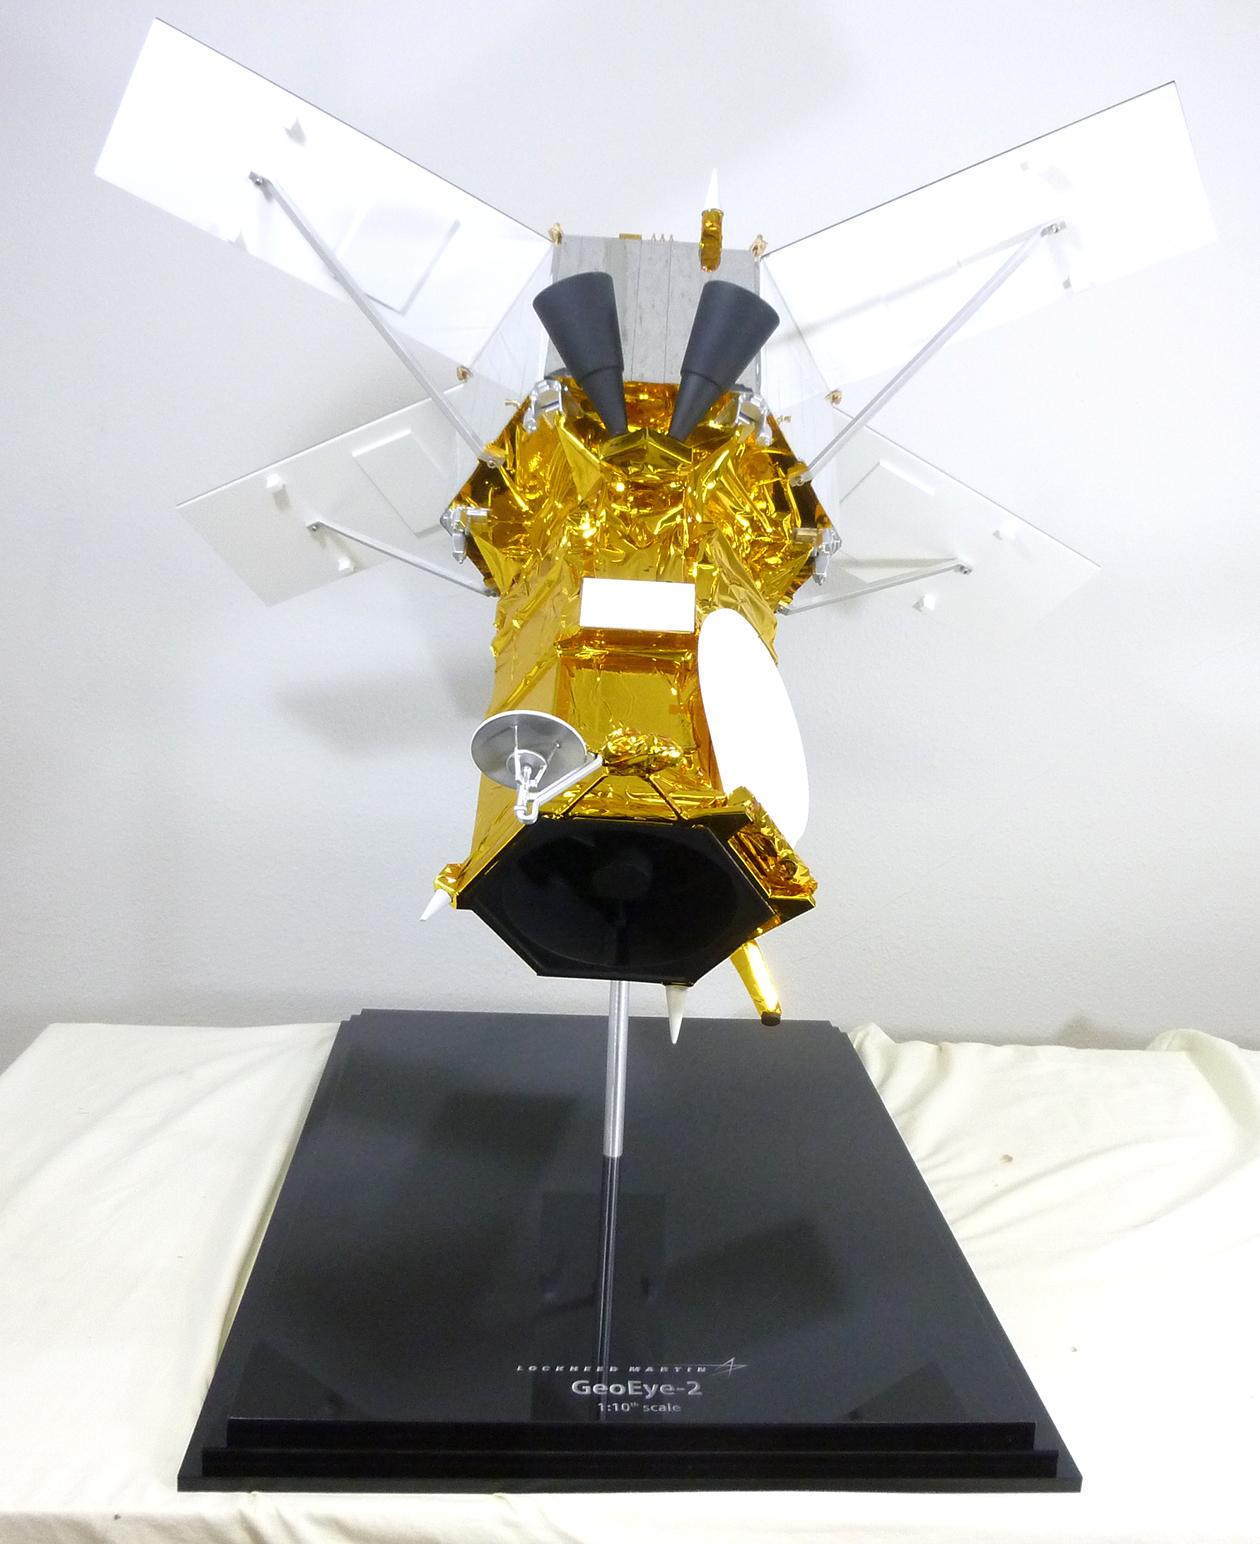 Lockheed Martin GeoEye-2 Satellite Model